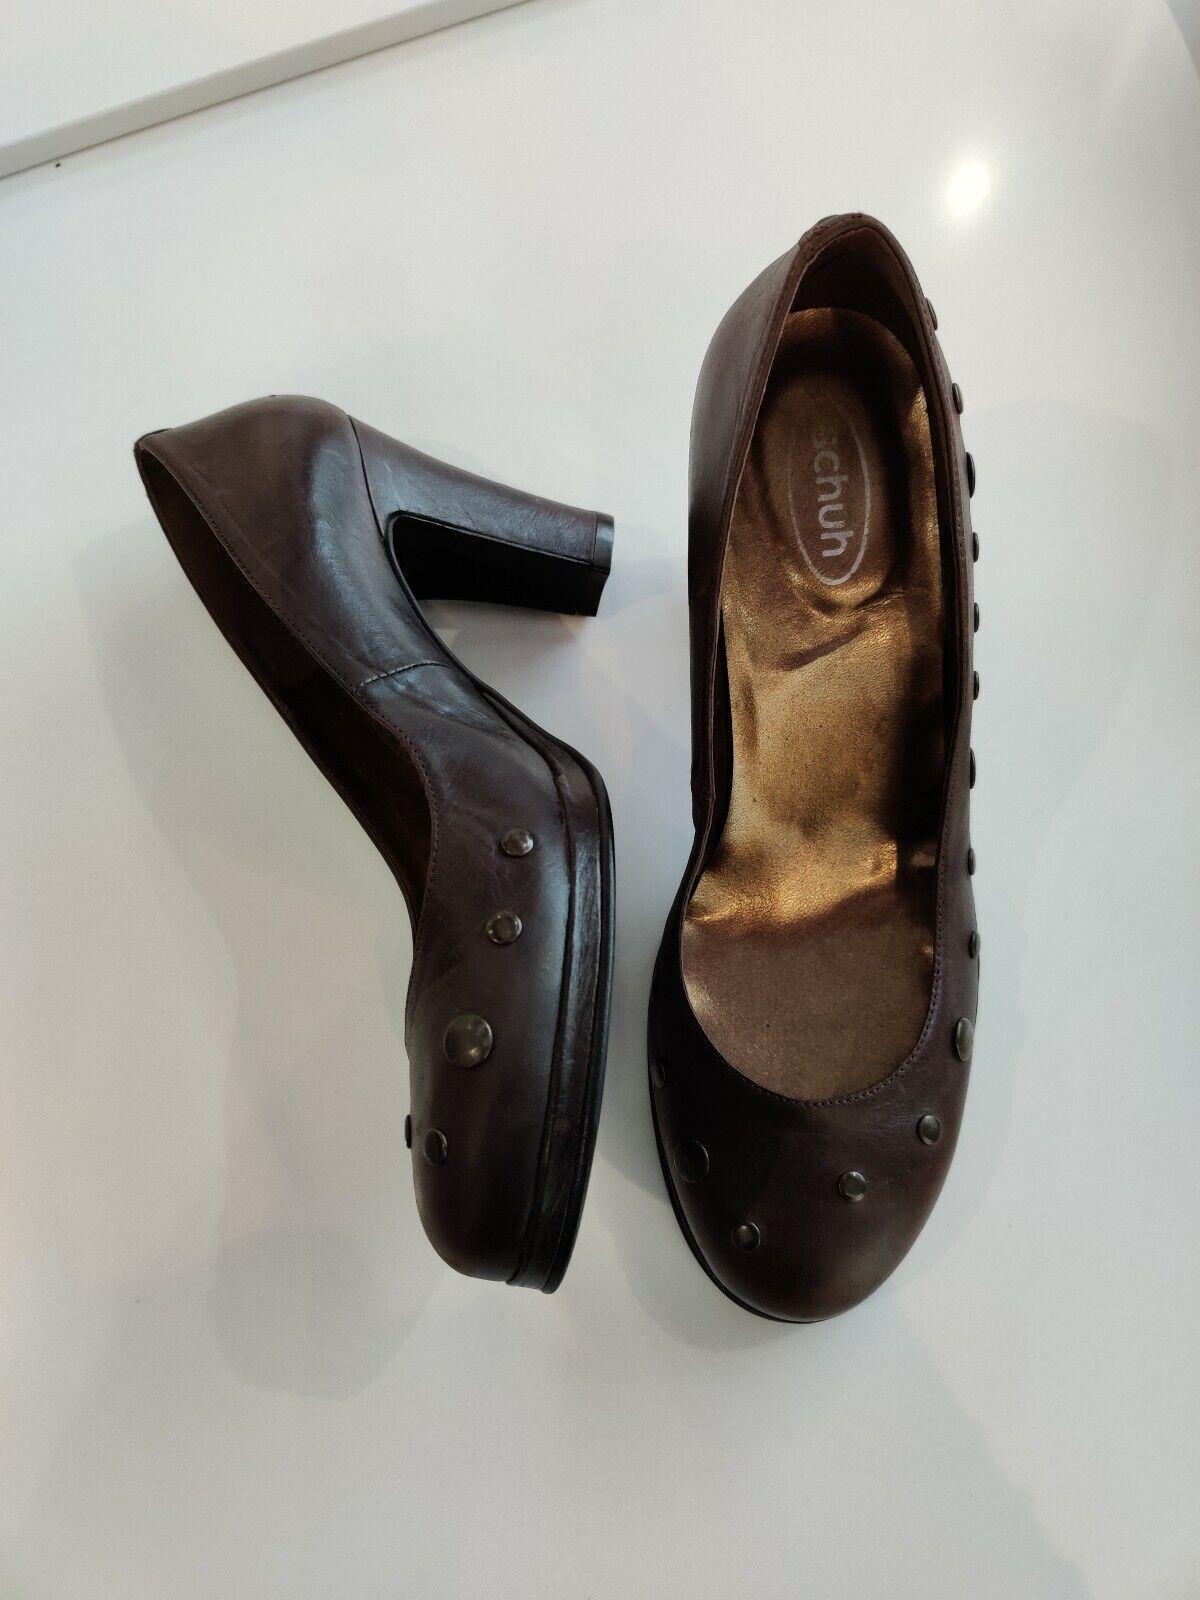 Womens SCHUH Chocolate Brown Platform Leather Shoes Size 5 EU38 Block Heel Studs